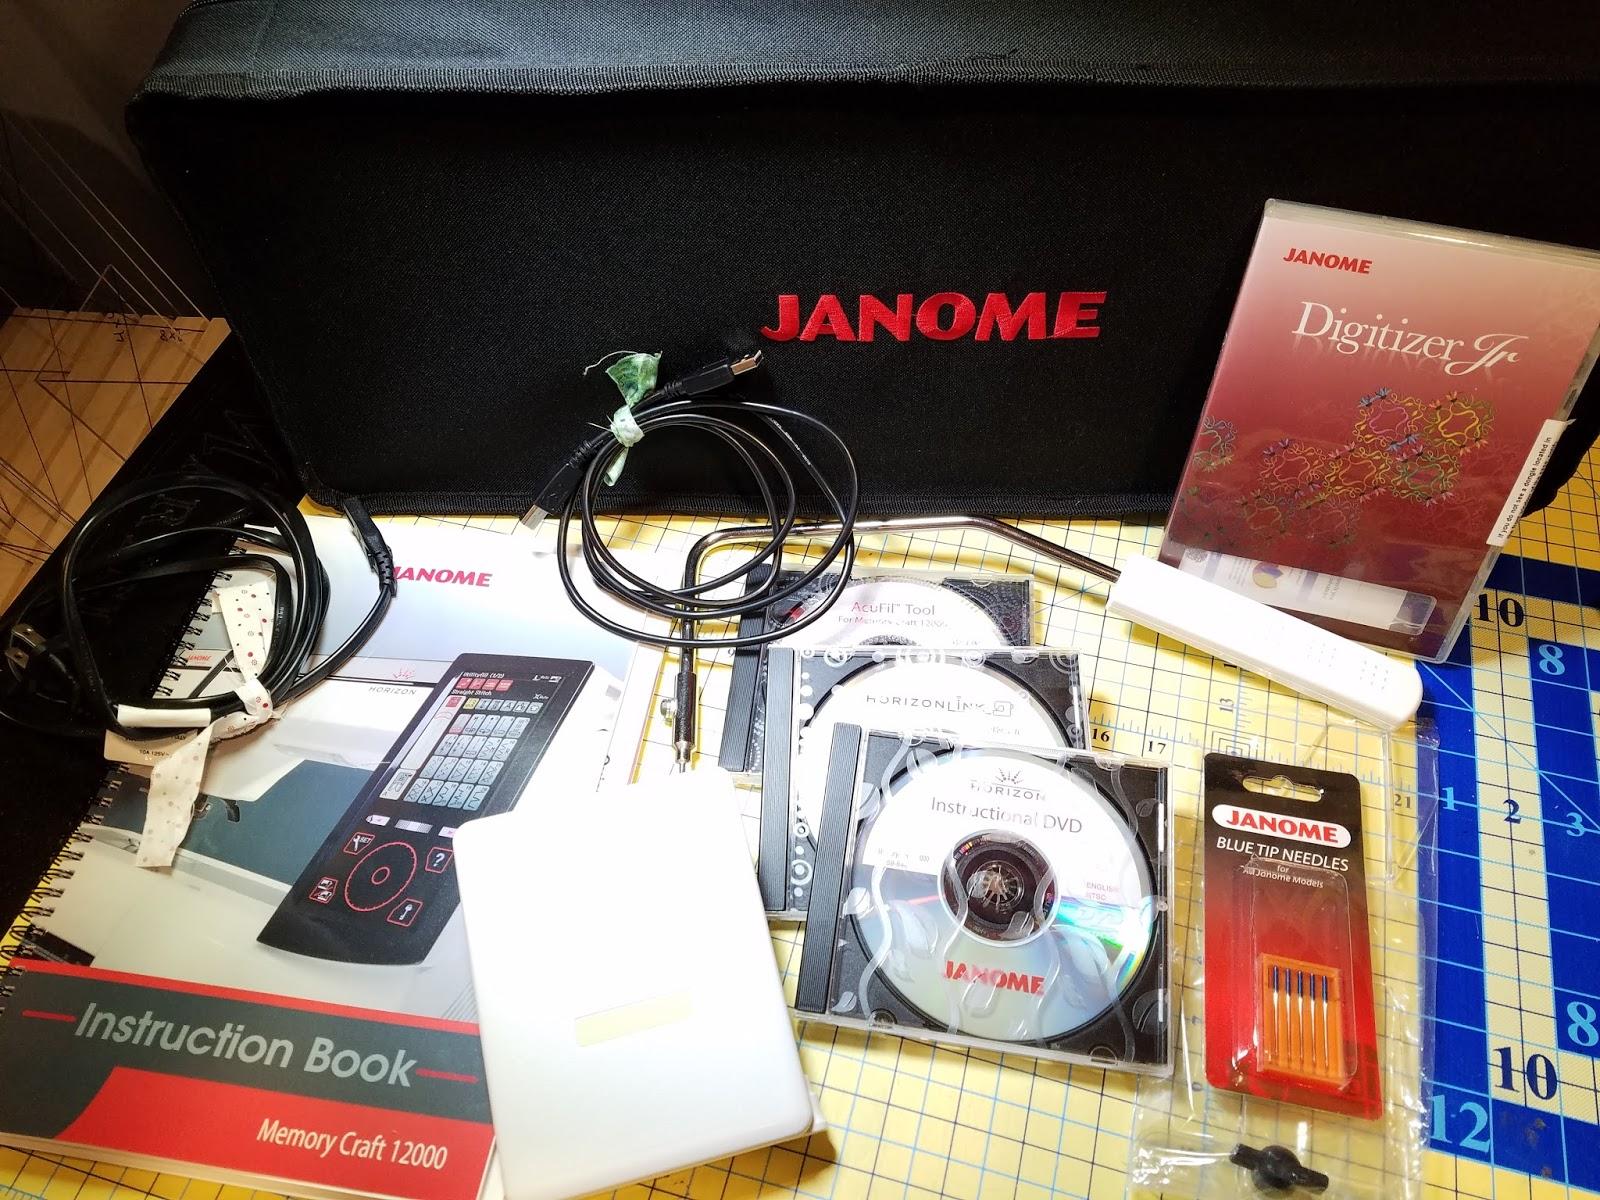 Janome memory craft 12000 - Http Janome Com En Machines Embroidery Horizon Memory Craft 12000